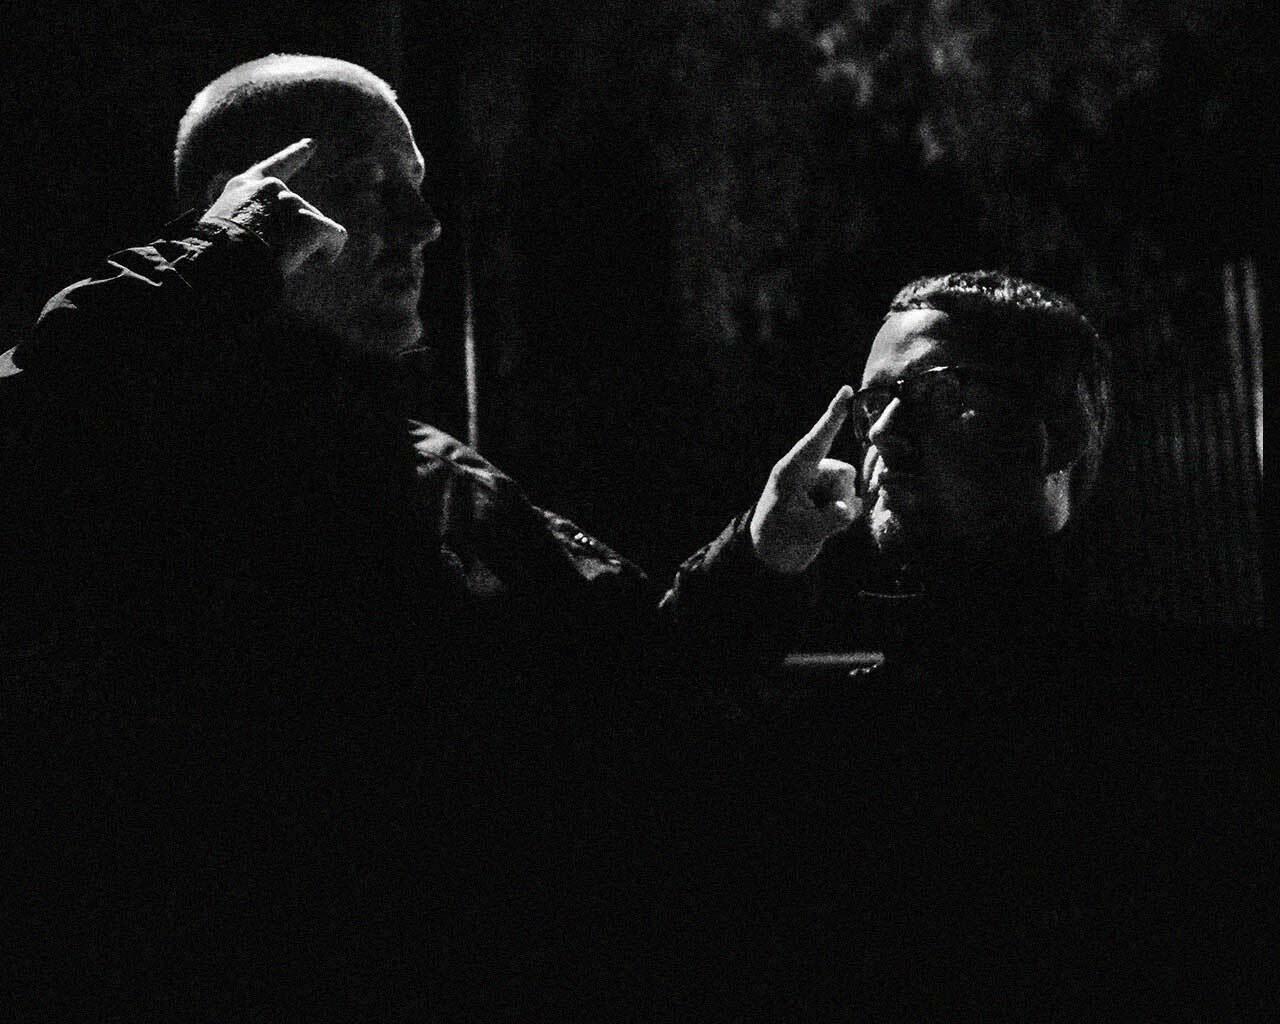 Taran & Lomov сыграли техно-сет на британском Threads Radio